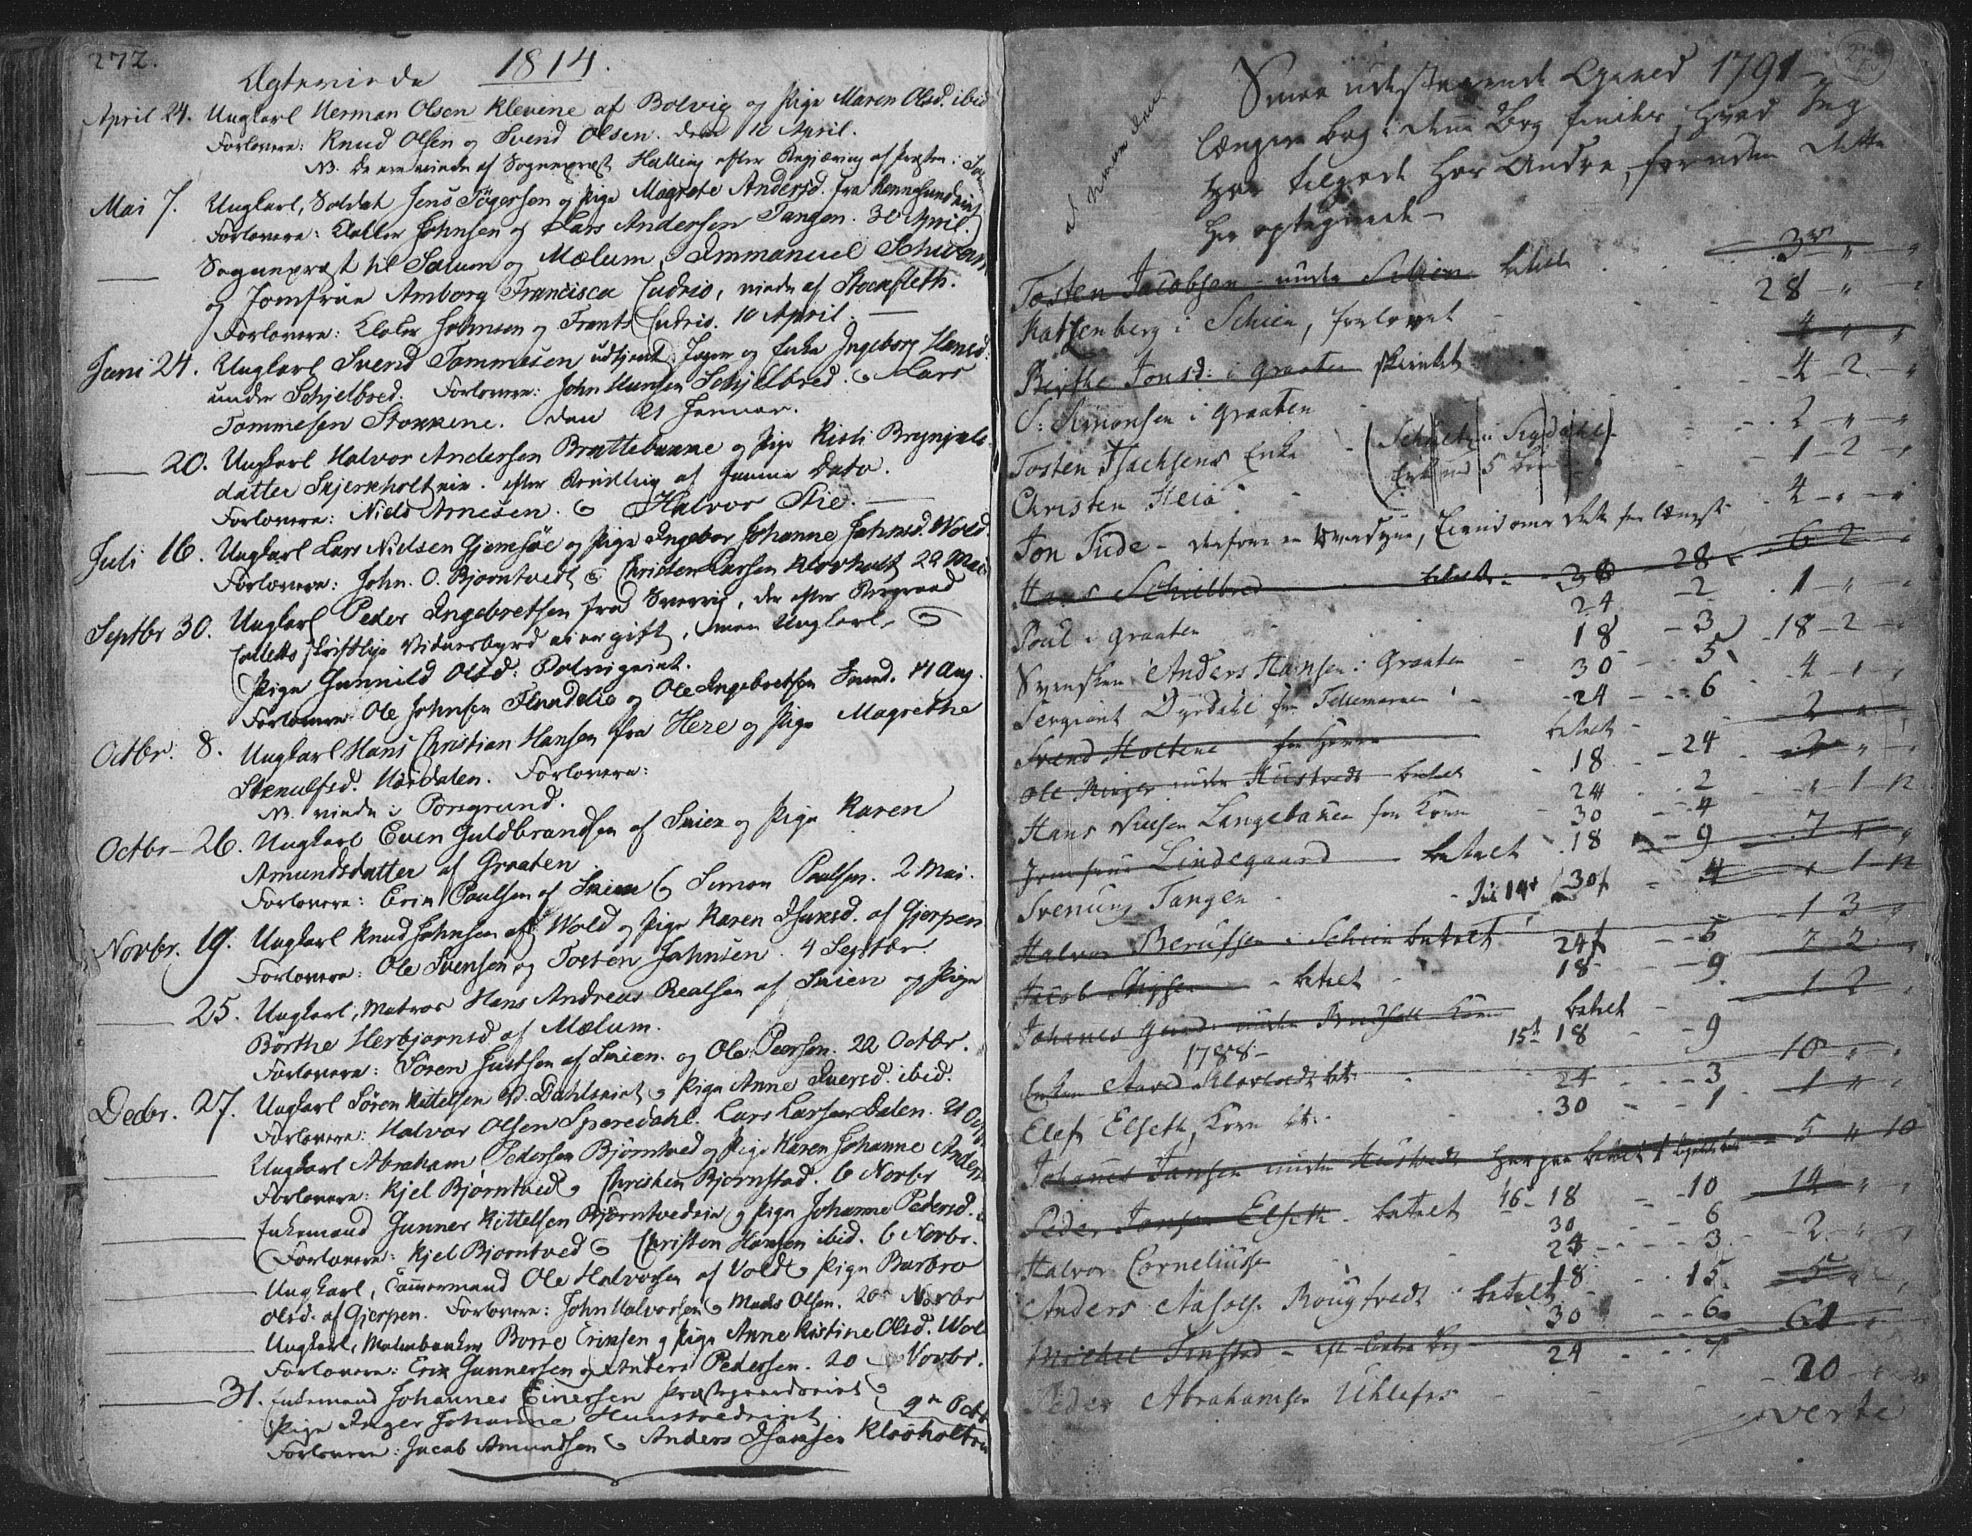 SAKO, Solum kirkebøker, F/Fa/L0003: Ministerialbok nr. I 3, 1761-1814, s. 272-273